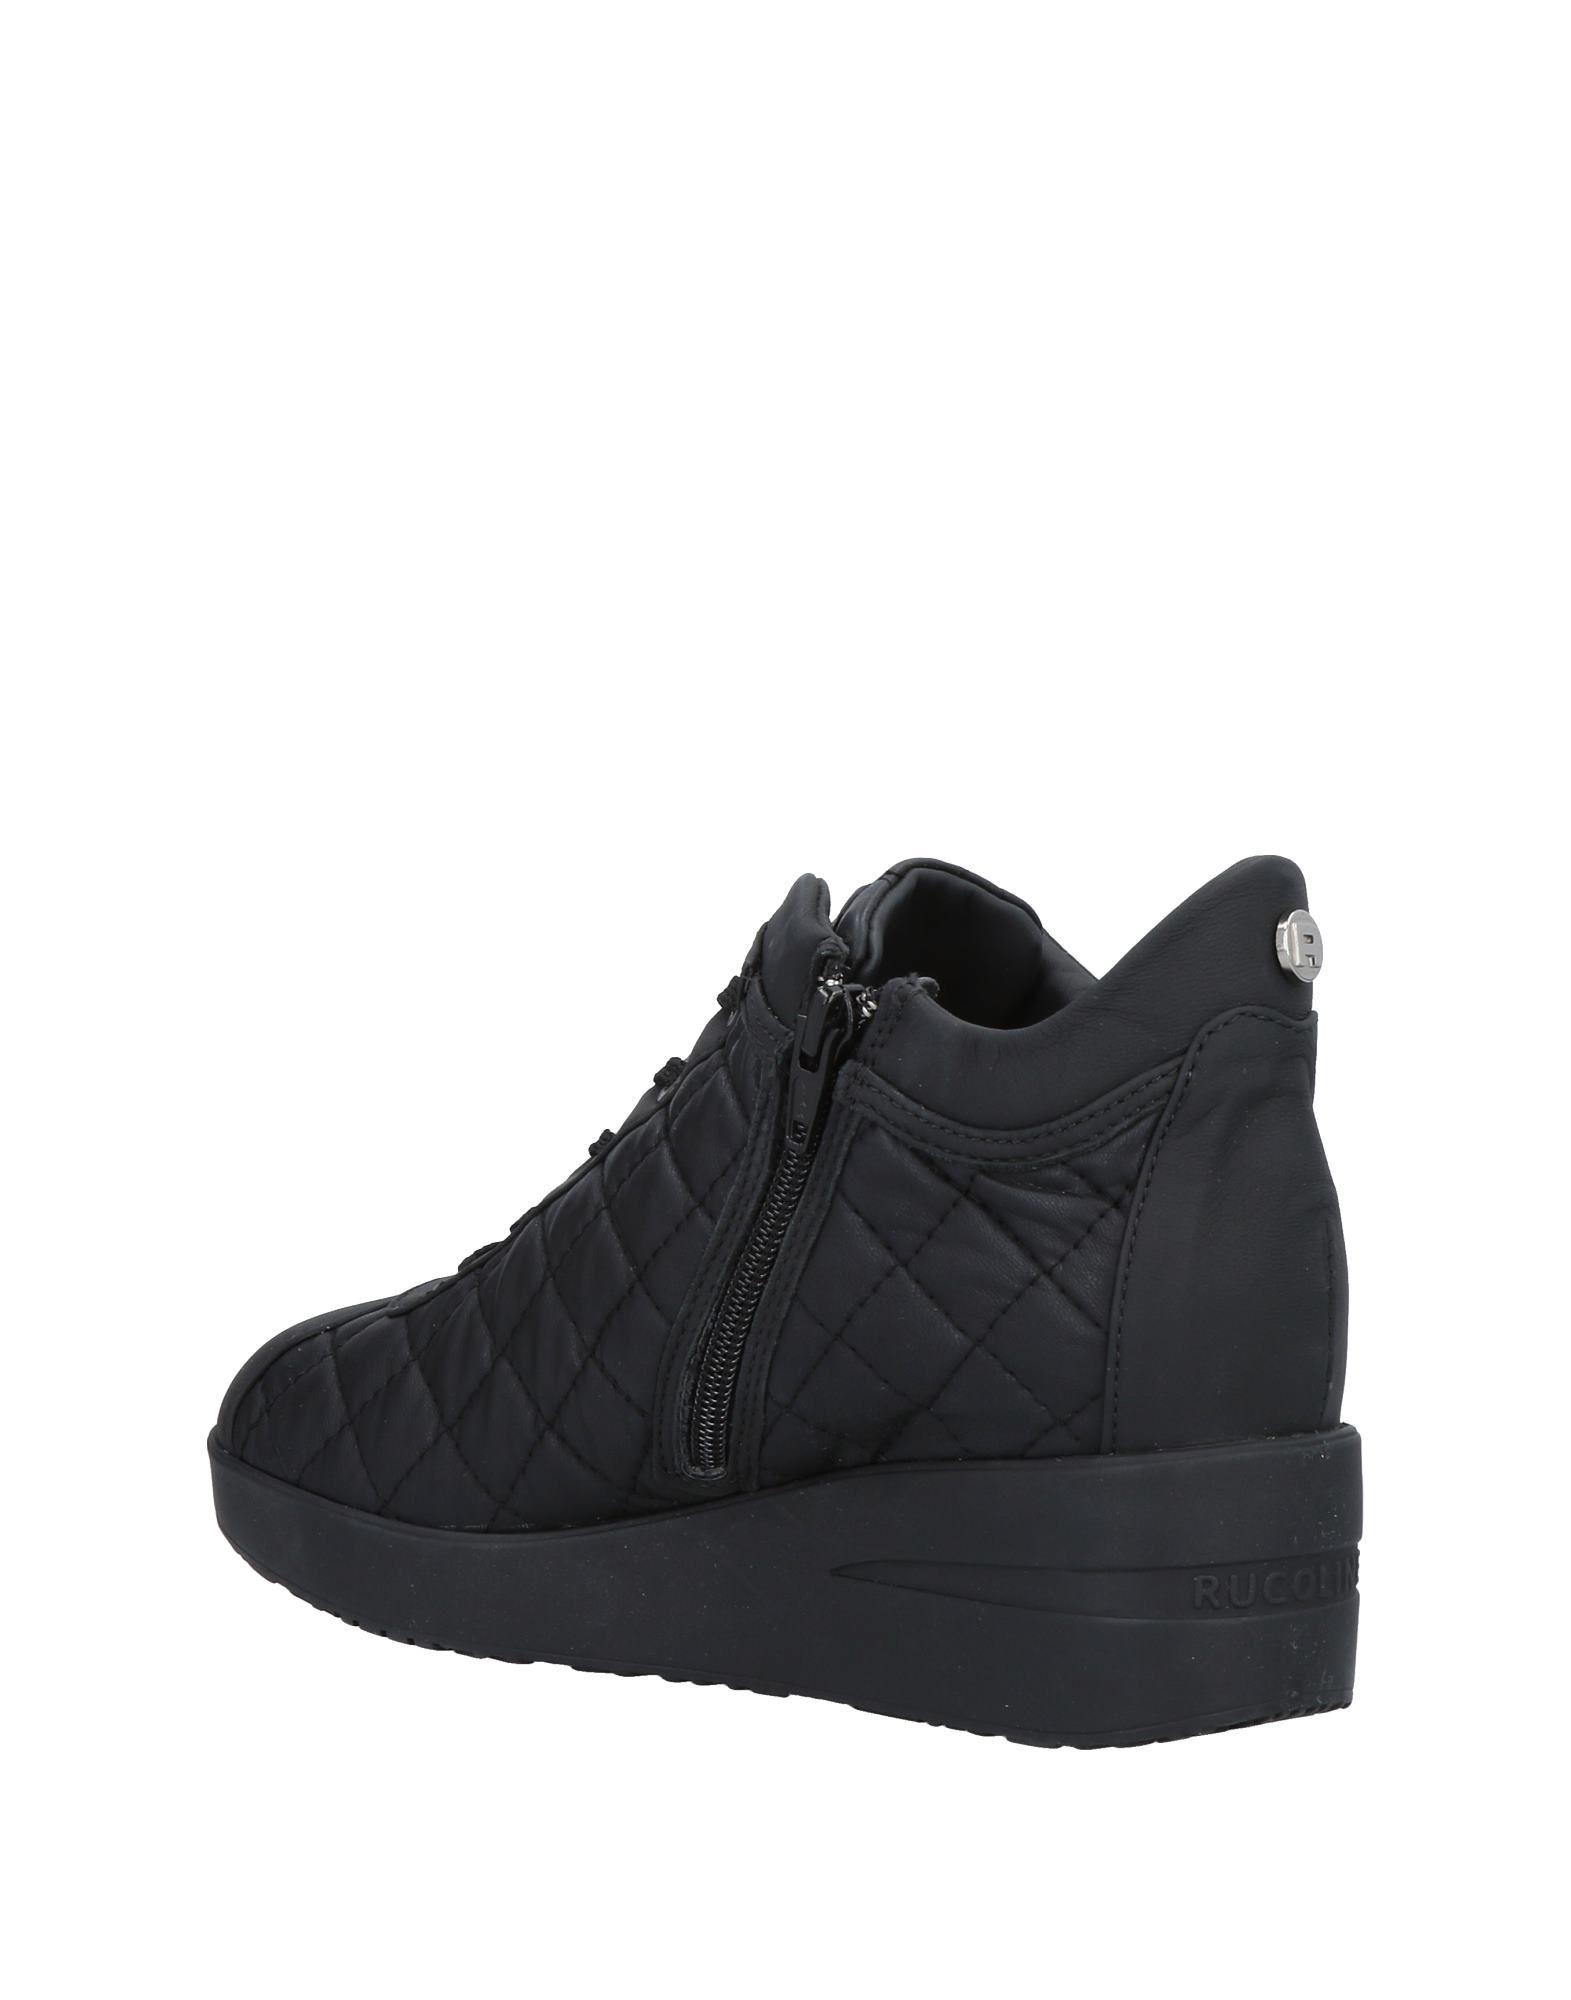 Gut um Line billige Schuhe zu tragenRuco Line um Sneakers Damen  11476865XF 57aab0